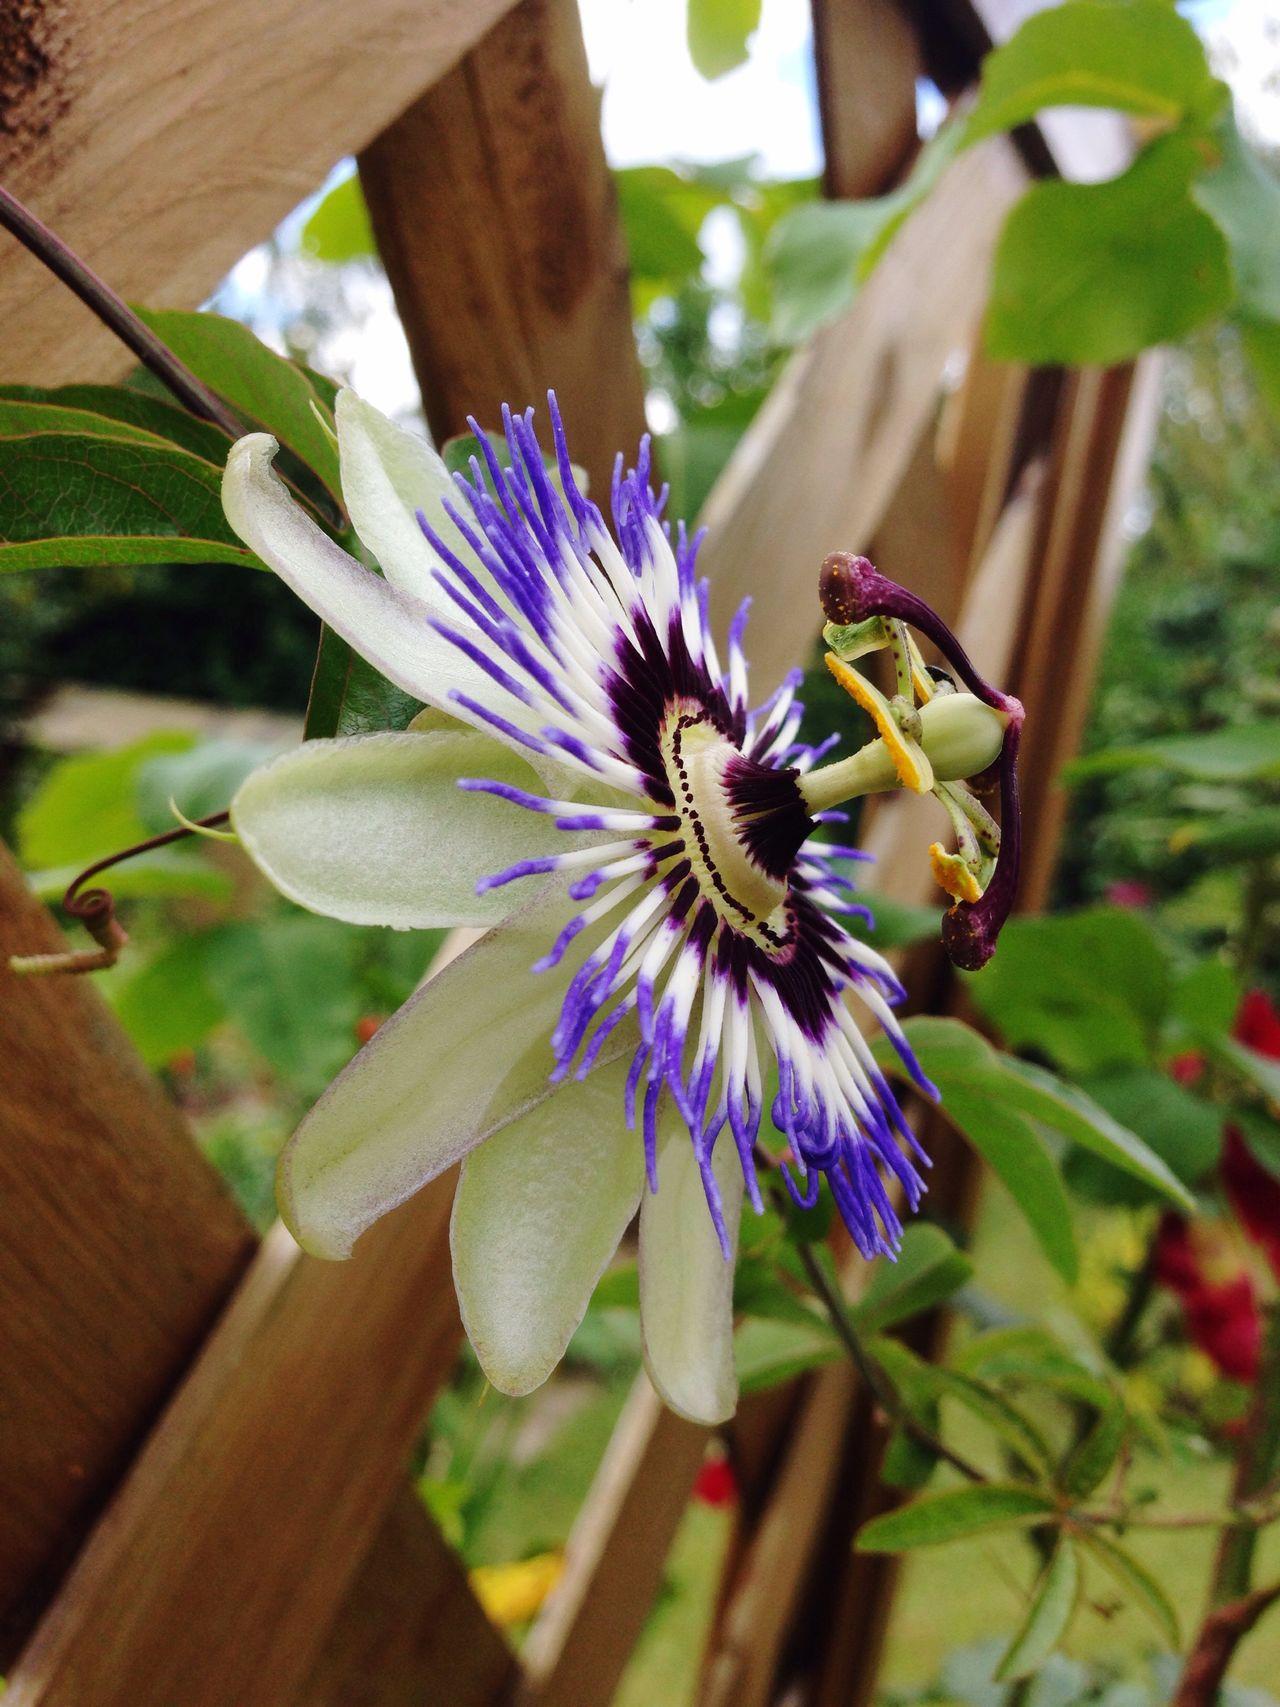 Gardening Passionsblume Passionflower Passionfruit Flourishing Garden Garden Photography Hobby Flower